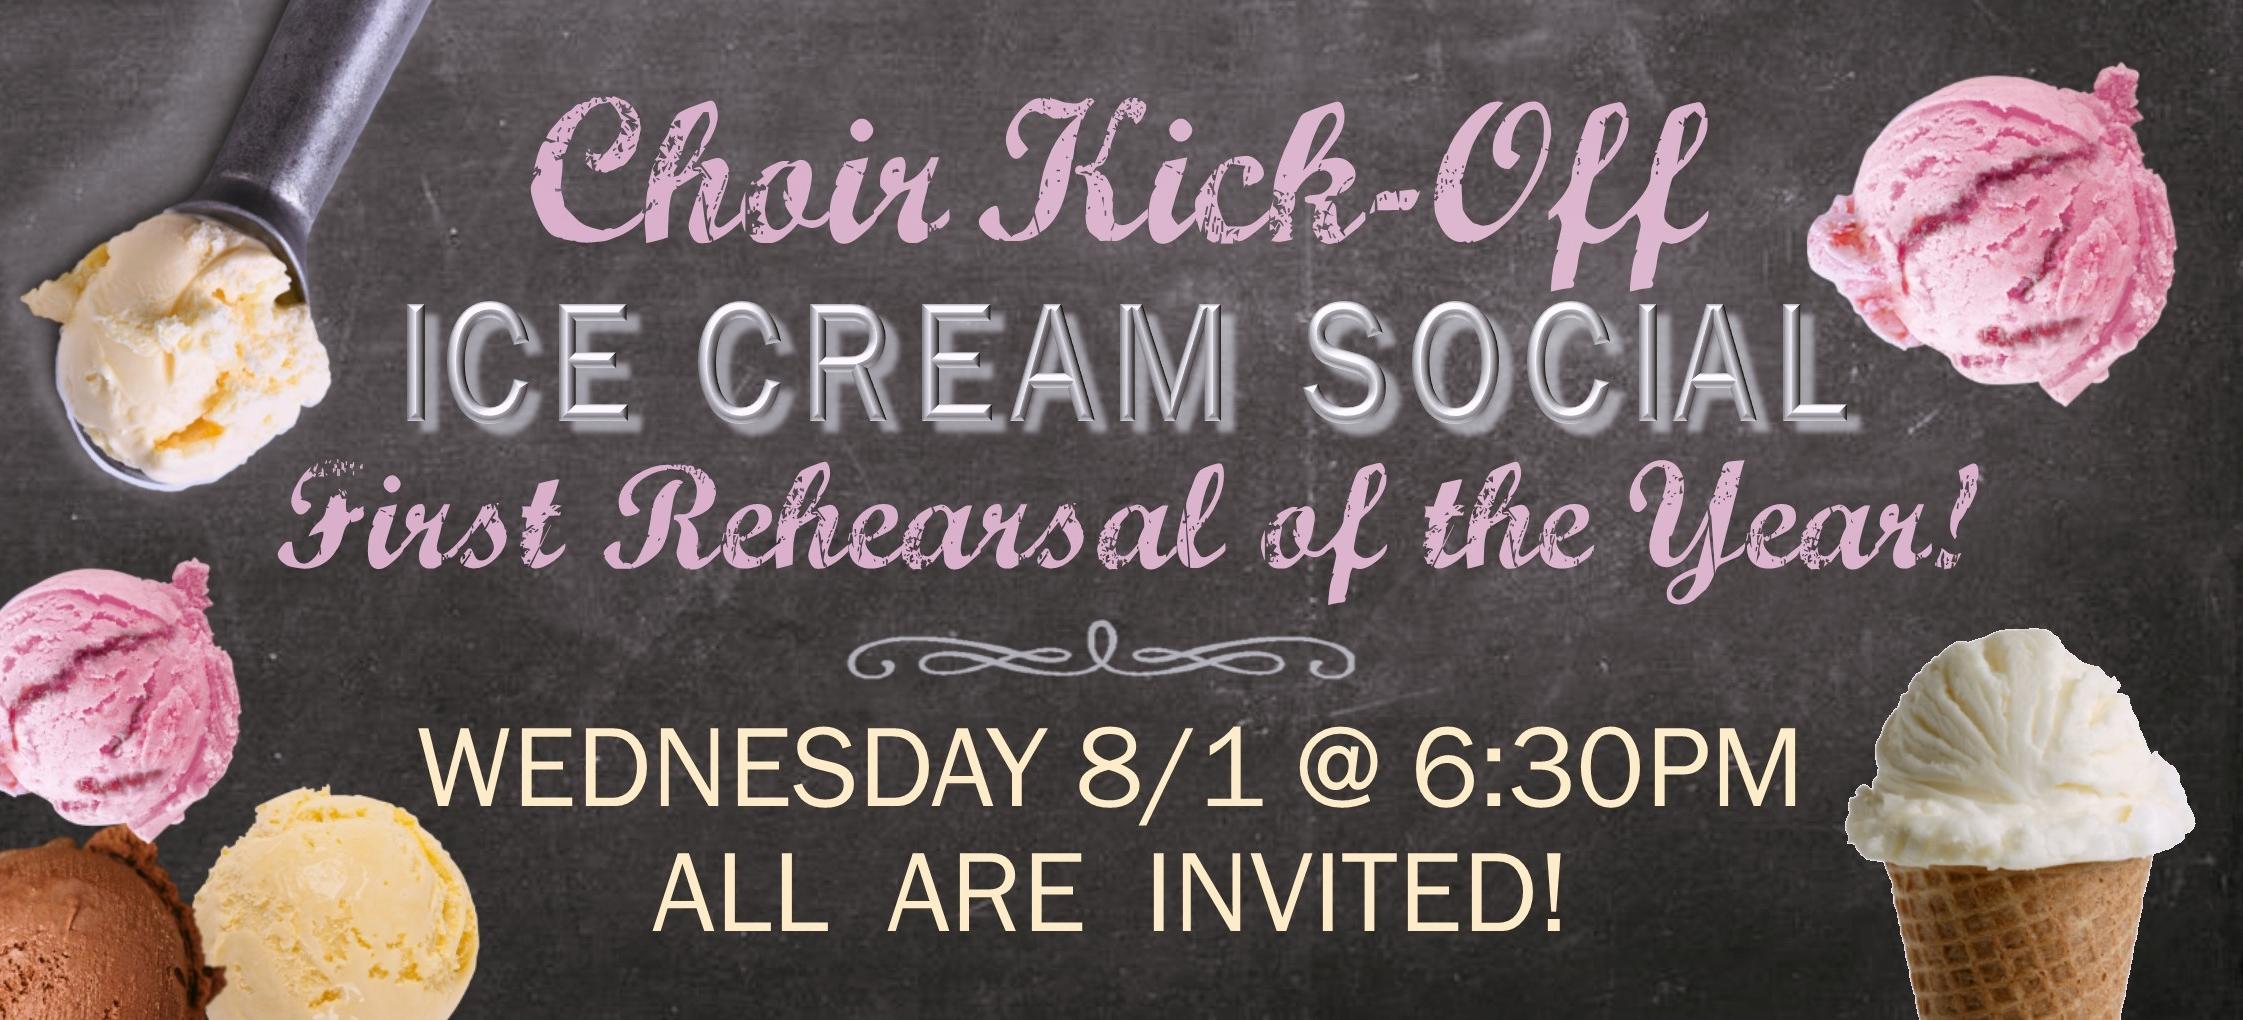 Ice Cream Social Web Page 072418.jpg